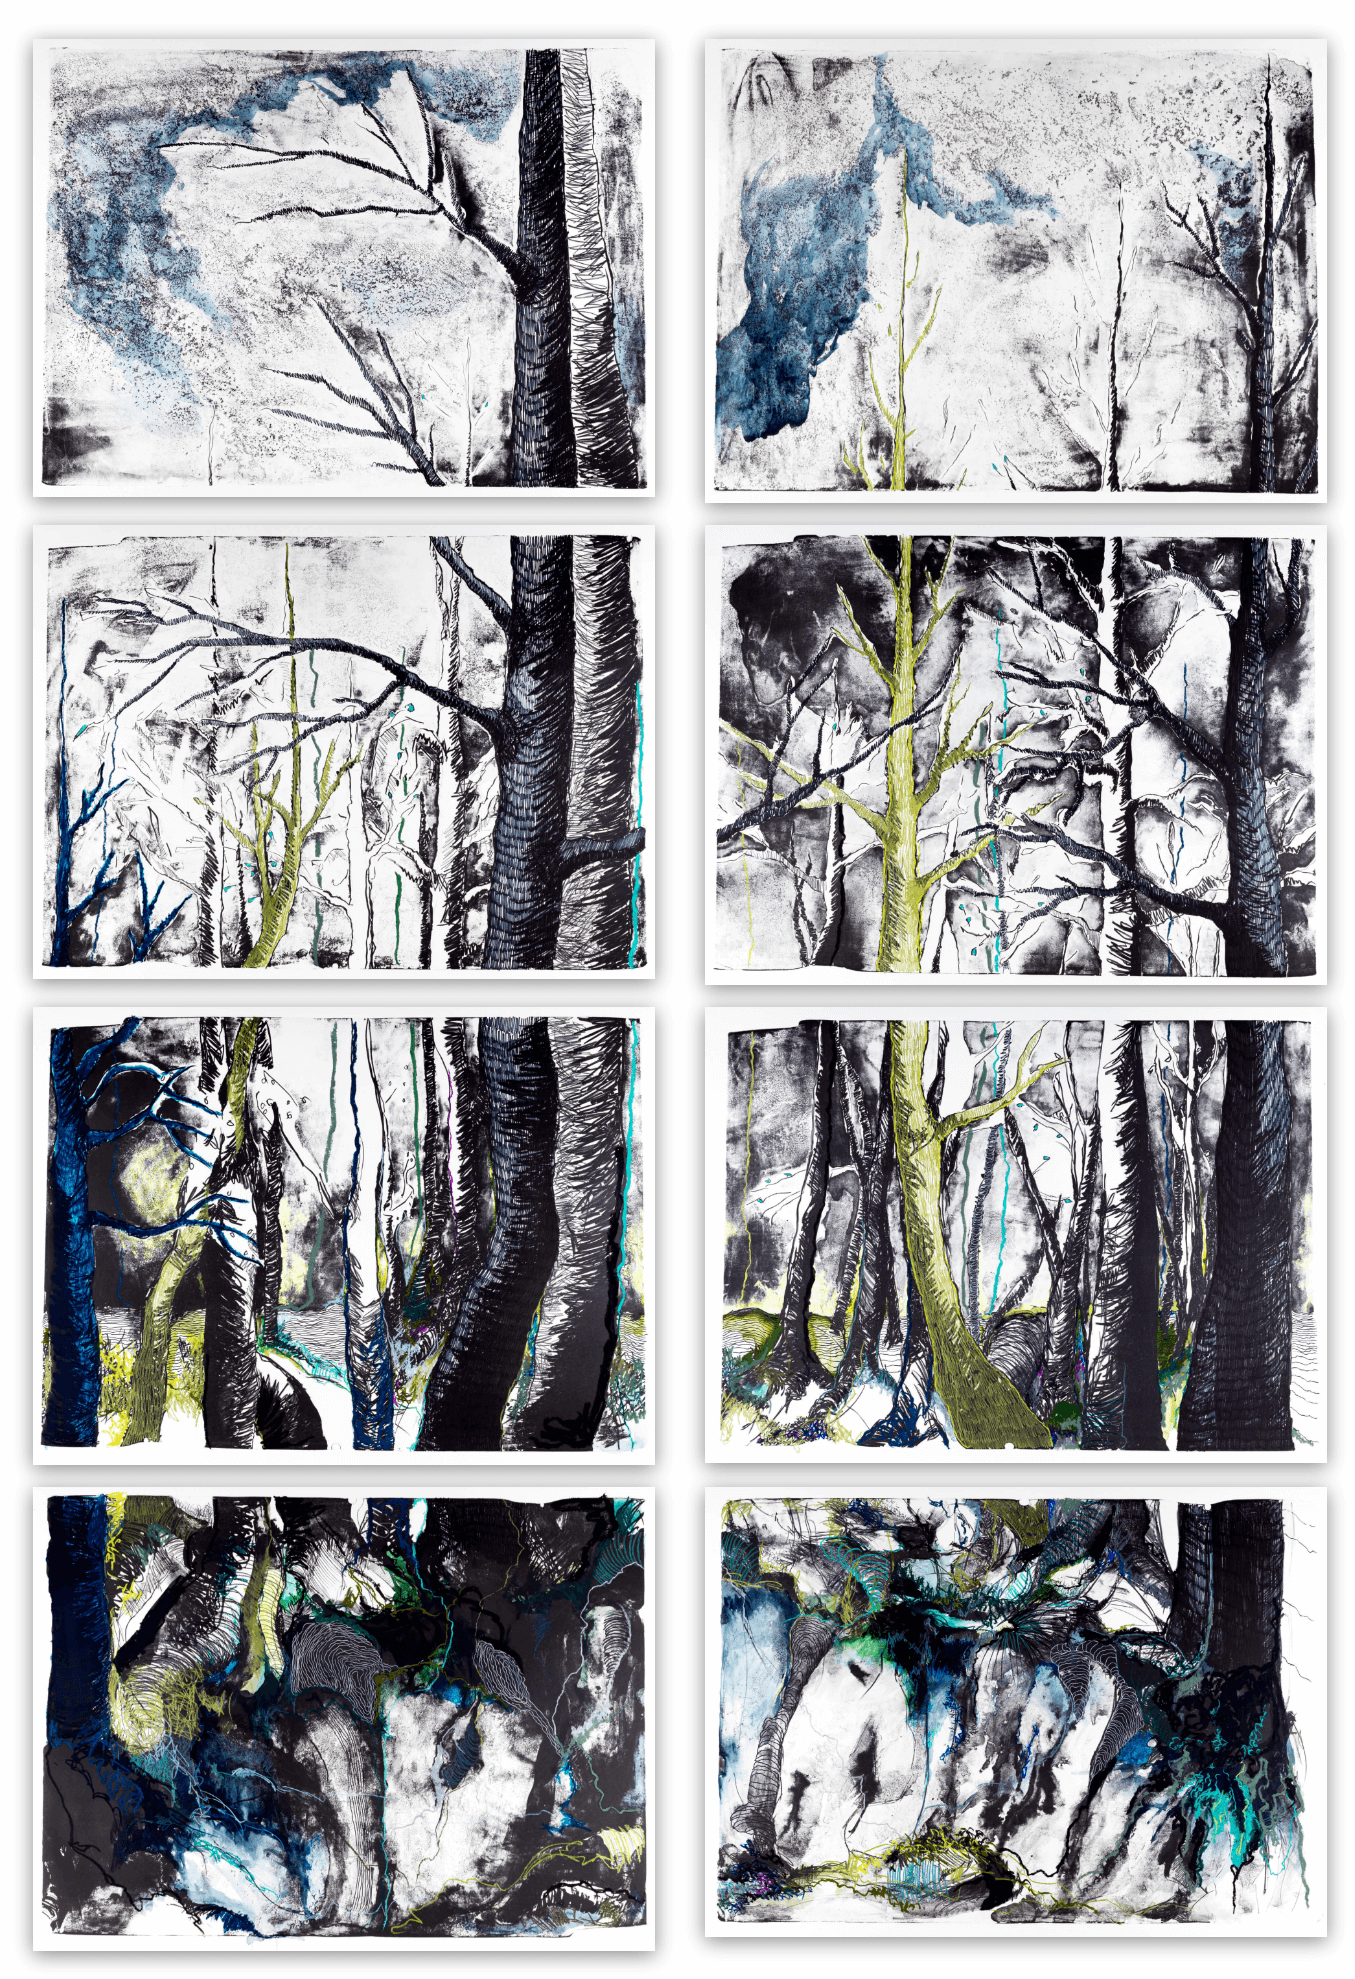 Katharina Albers, WALD-(FA), 2015 Lithographie handkoloriert (Ölkreide, Graphit, Aquarellfarbe, Fineliner) Unikat (8 Steine je 70×100 cm)